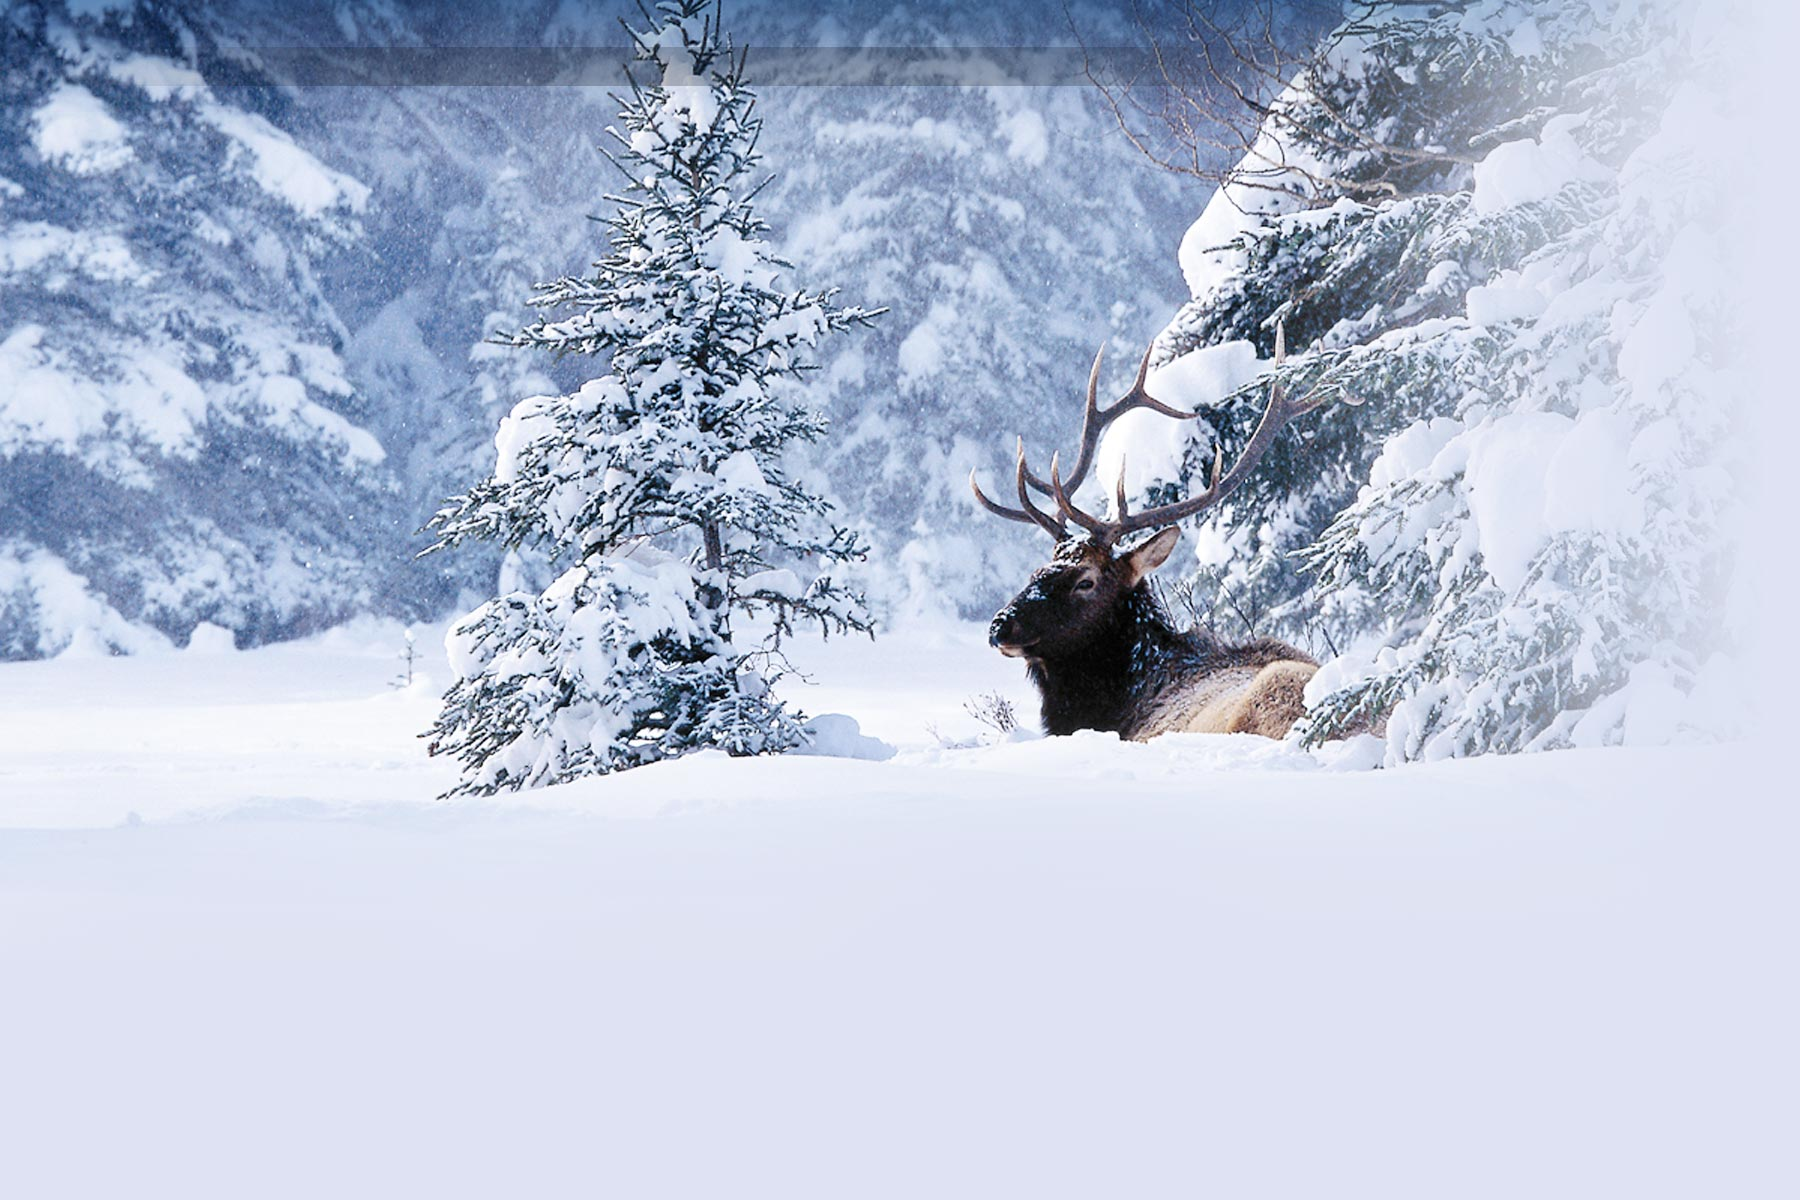 Ipad Hd Wallpaper Nature: Beautiful Winter Wallpapers For IPads